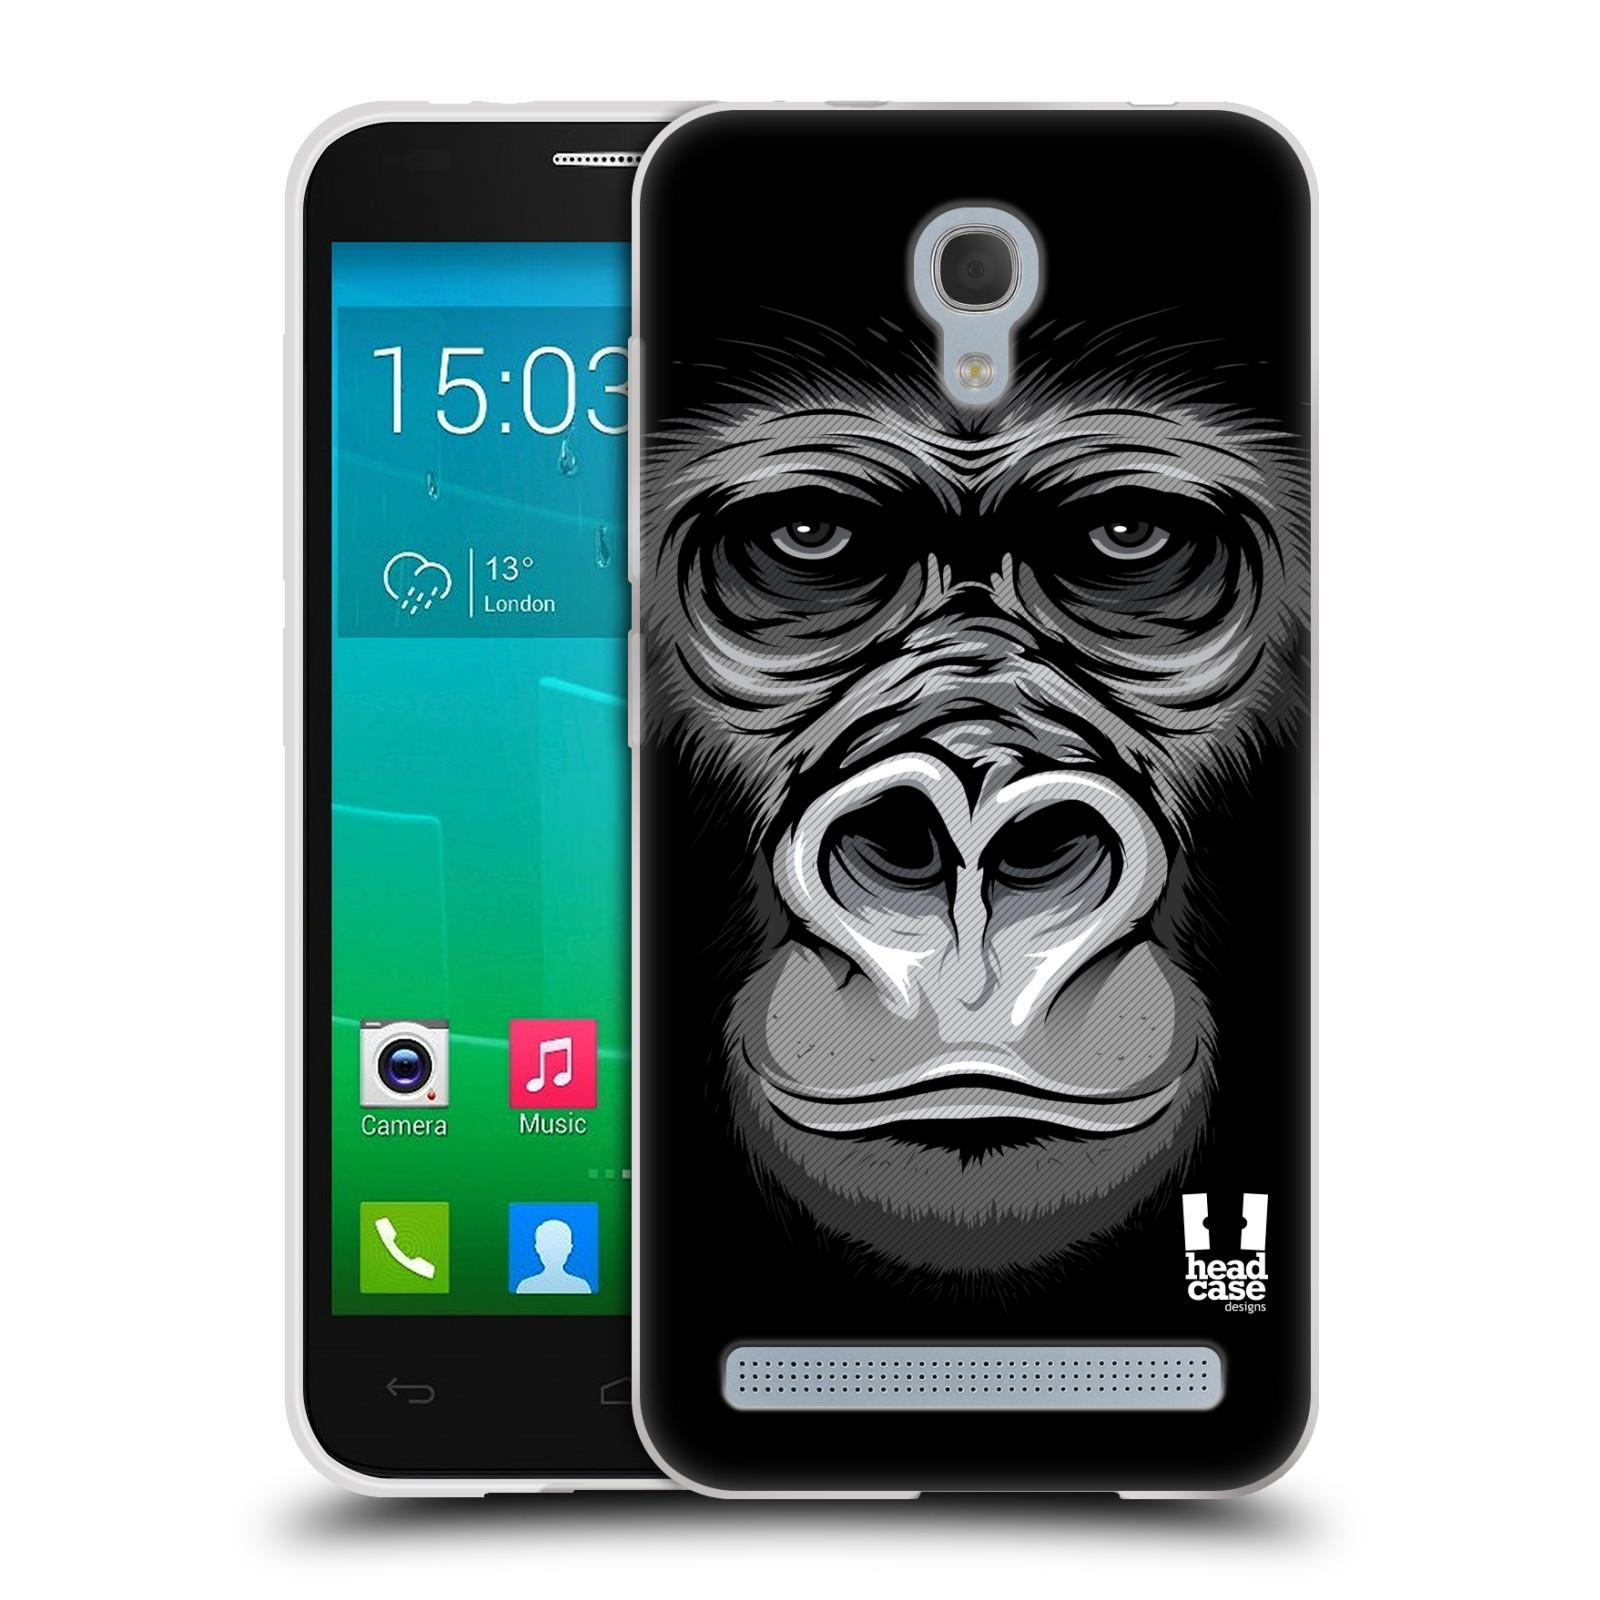 HEAD CASE silikonový obal na mobil Alcatel Idol 2 MINI S 6036Y vzor Zvíře kreslená tvář 2 gorila